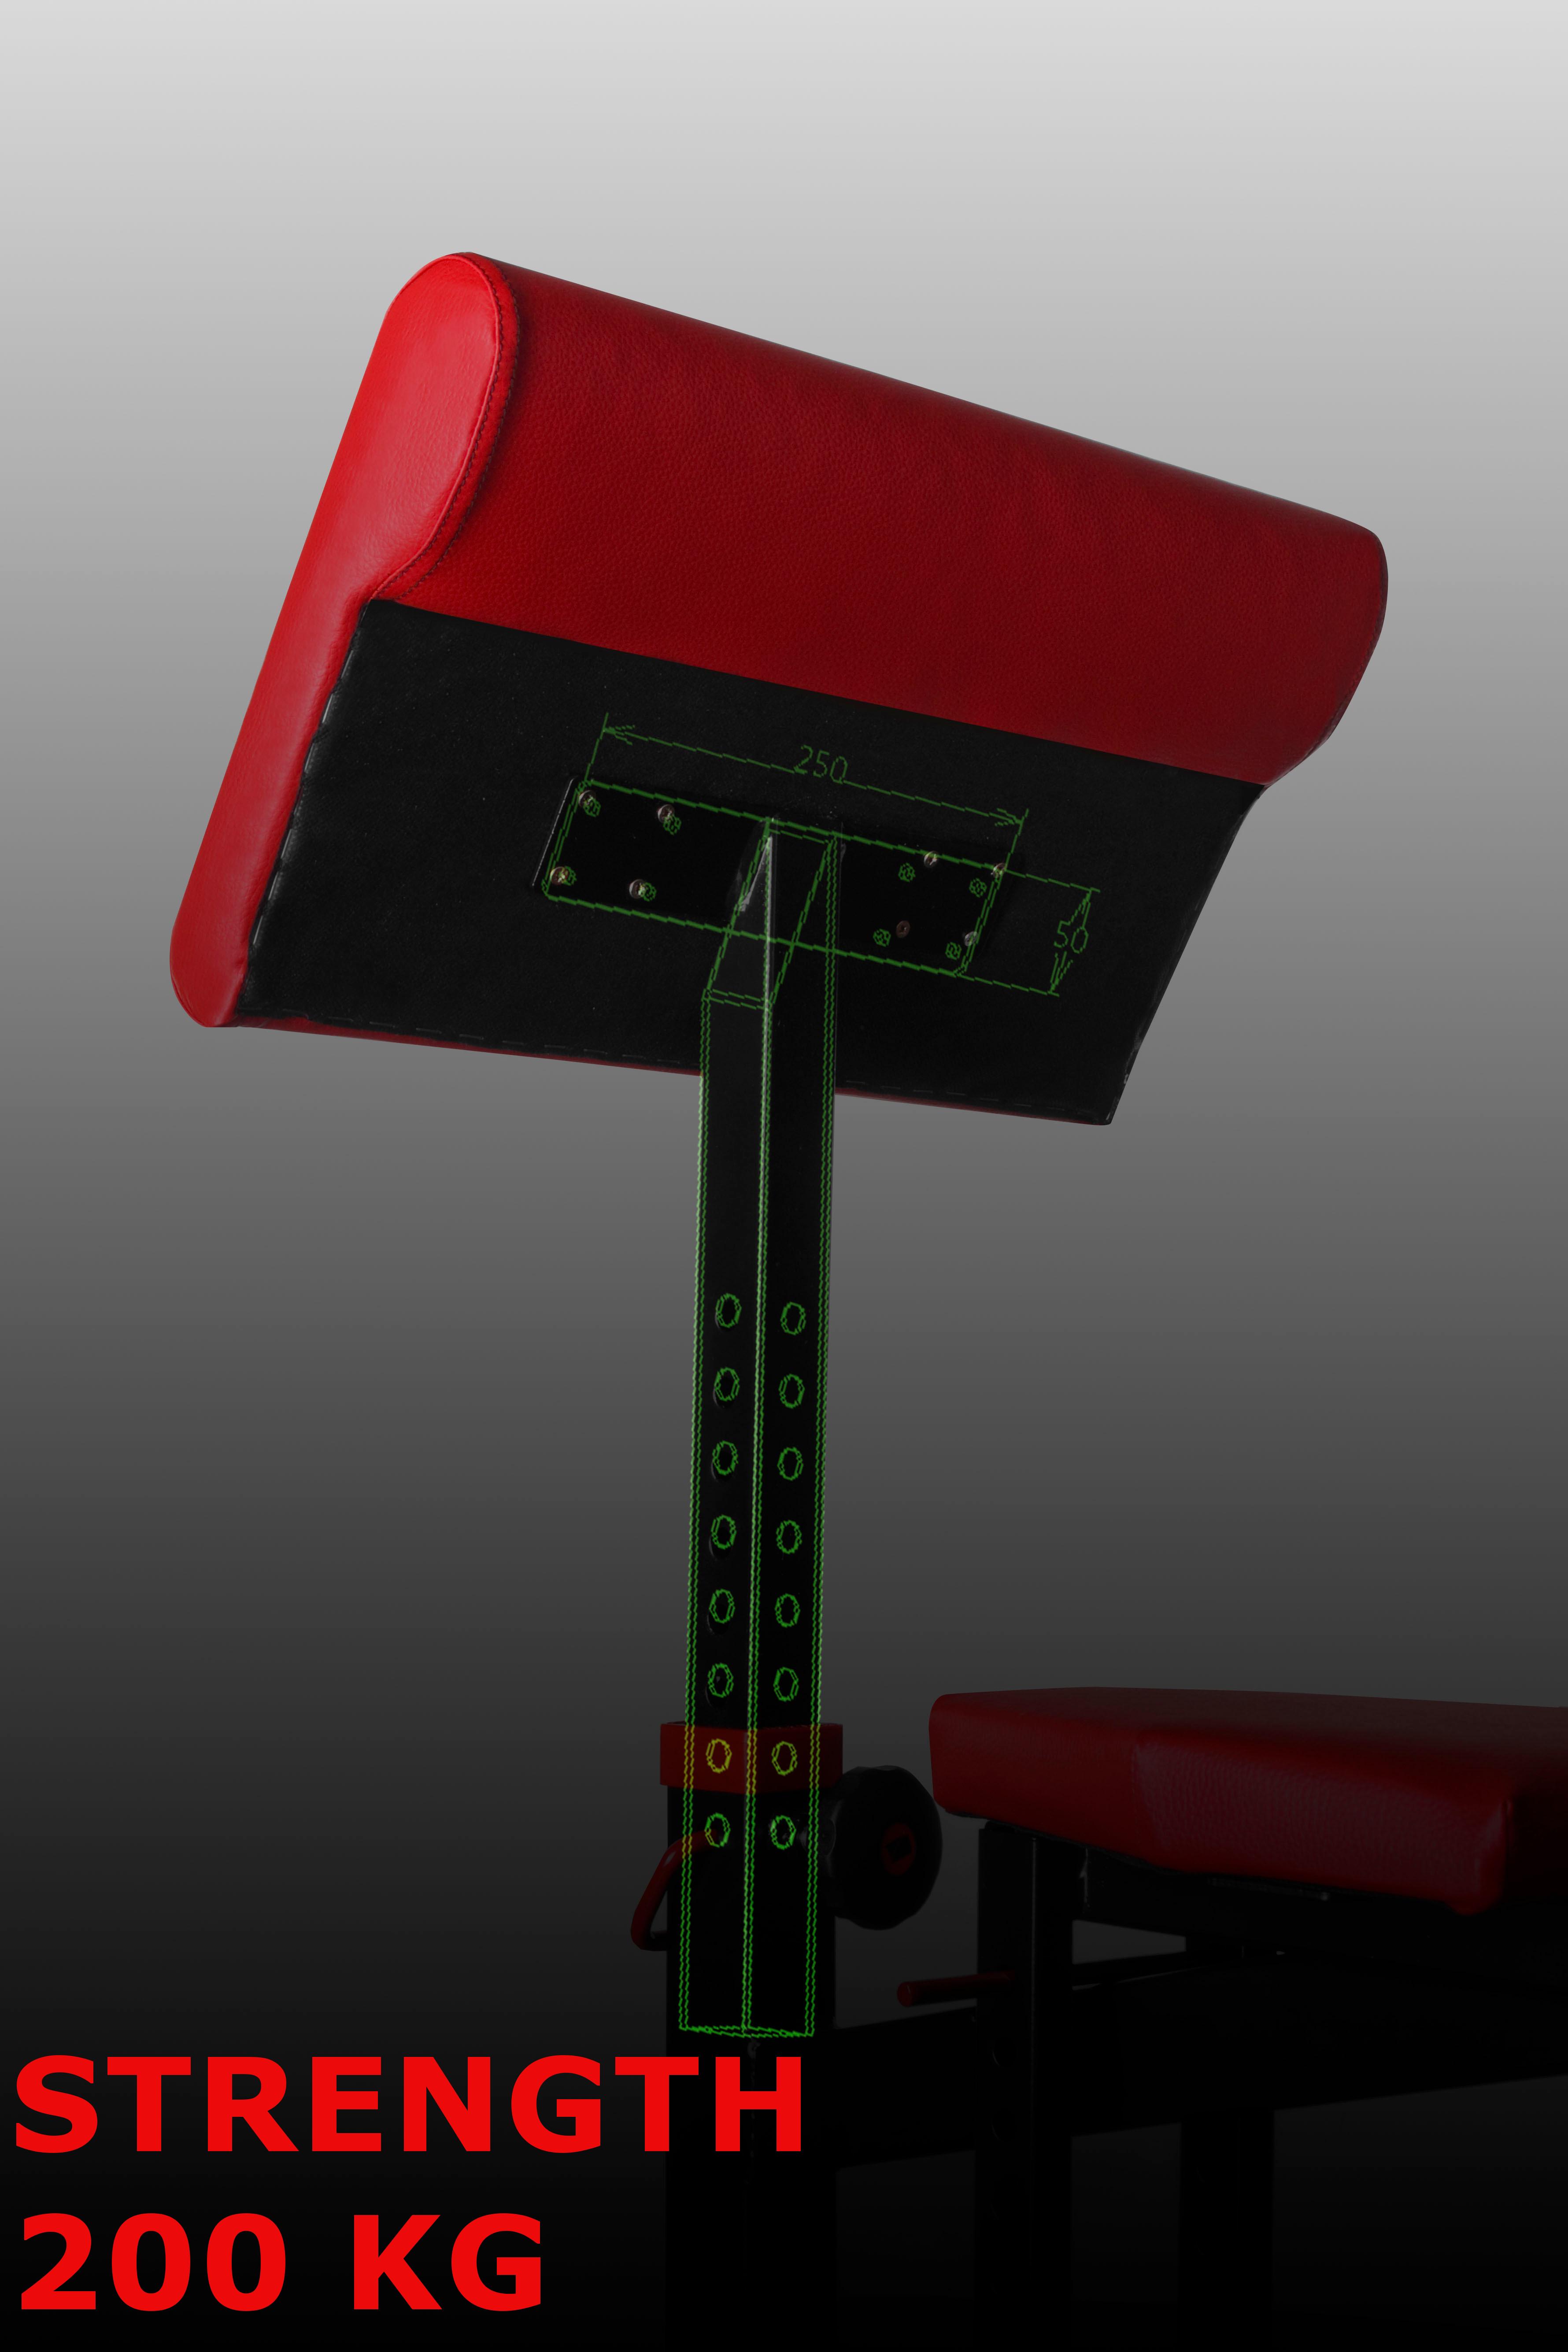 200 kg hz1 preacher arm bench bizeps gewichtheben heim fitness ger te hantel ebay. Black Bedroom Furniture Sets. Home Design Ideas